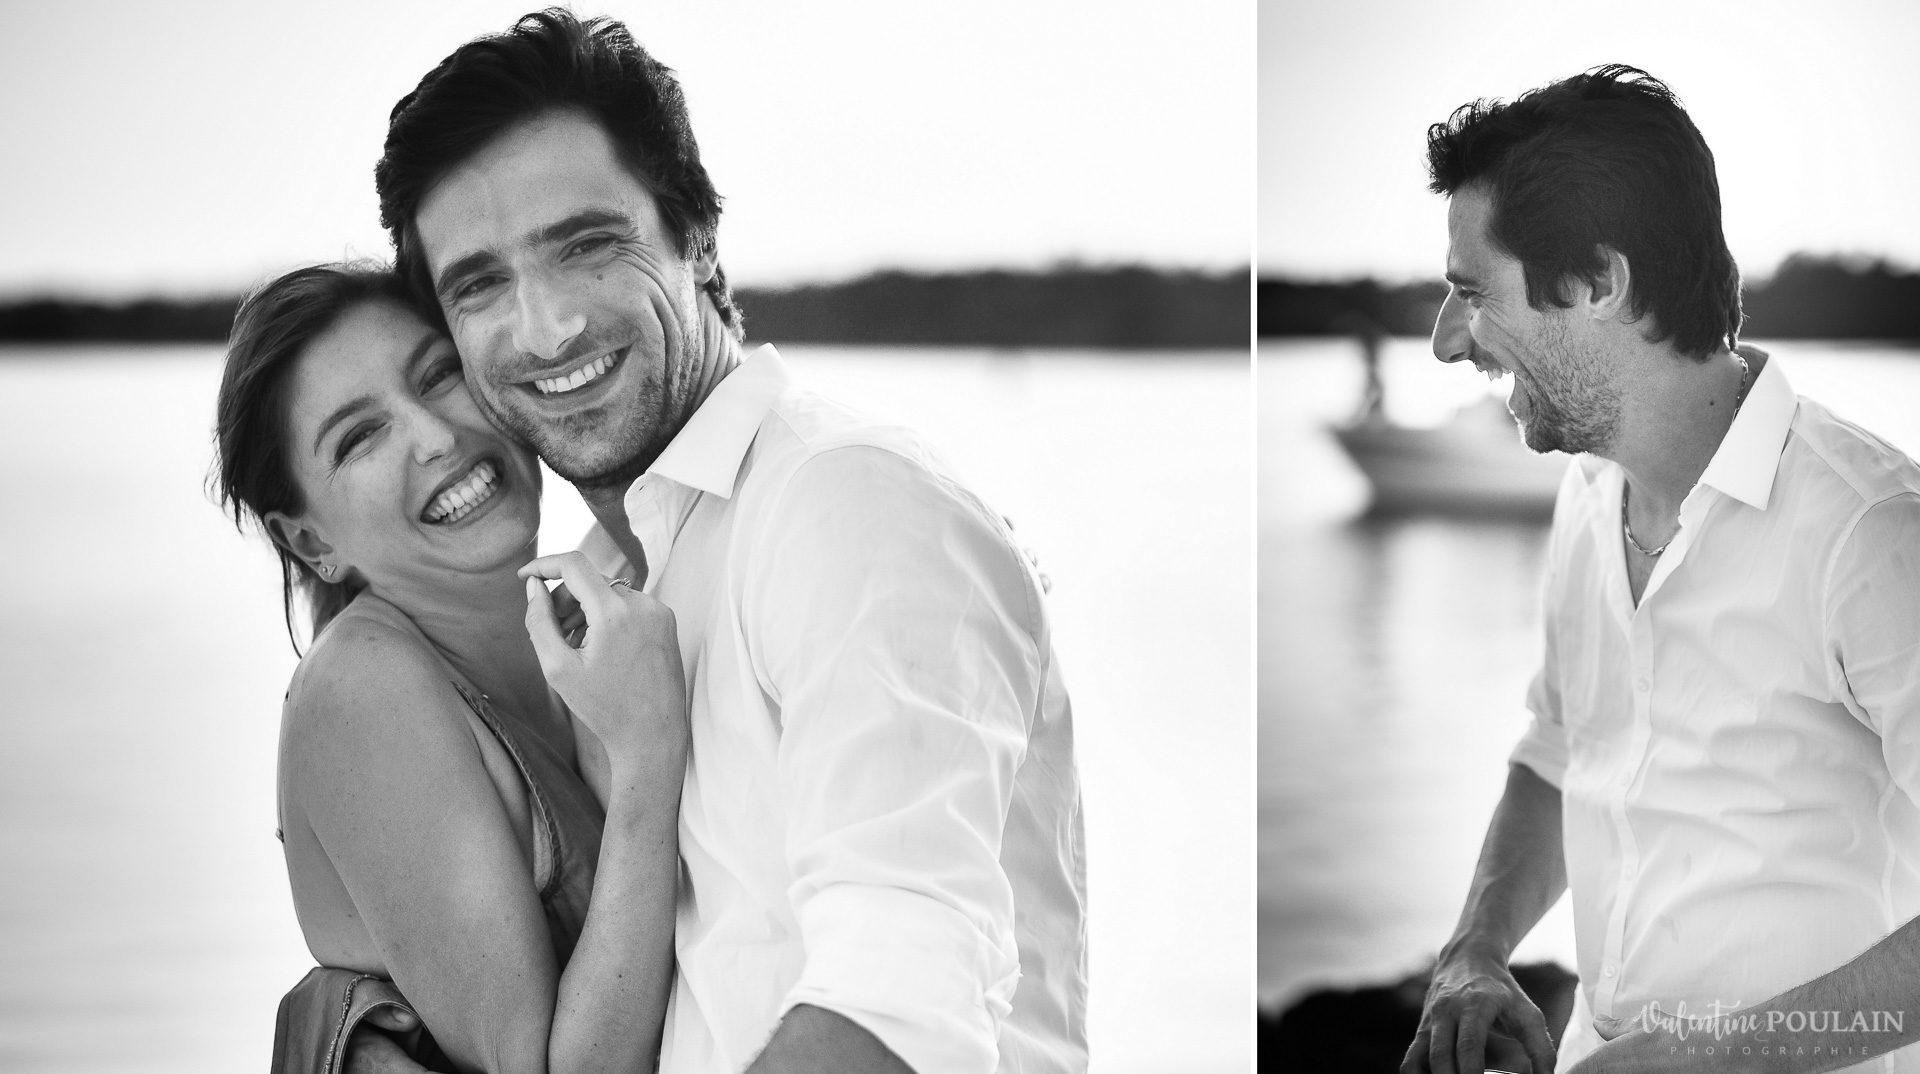 Couple Miam Keys Florida - Valentine Poulain couple